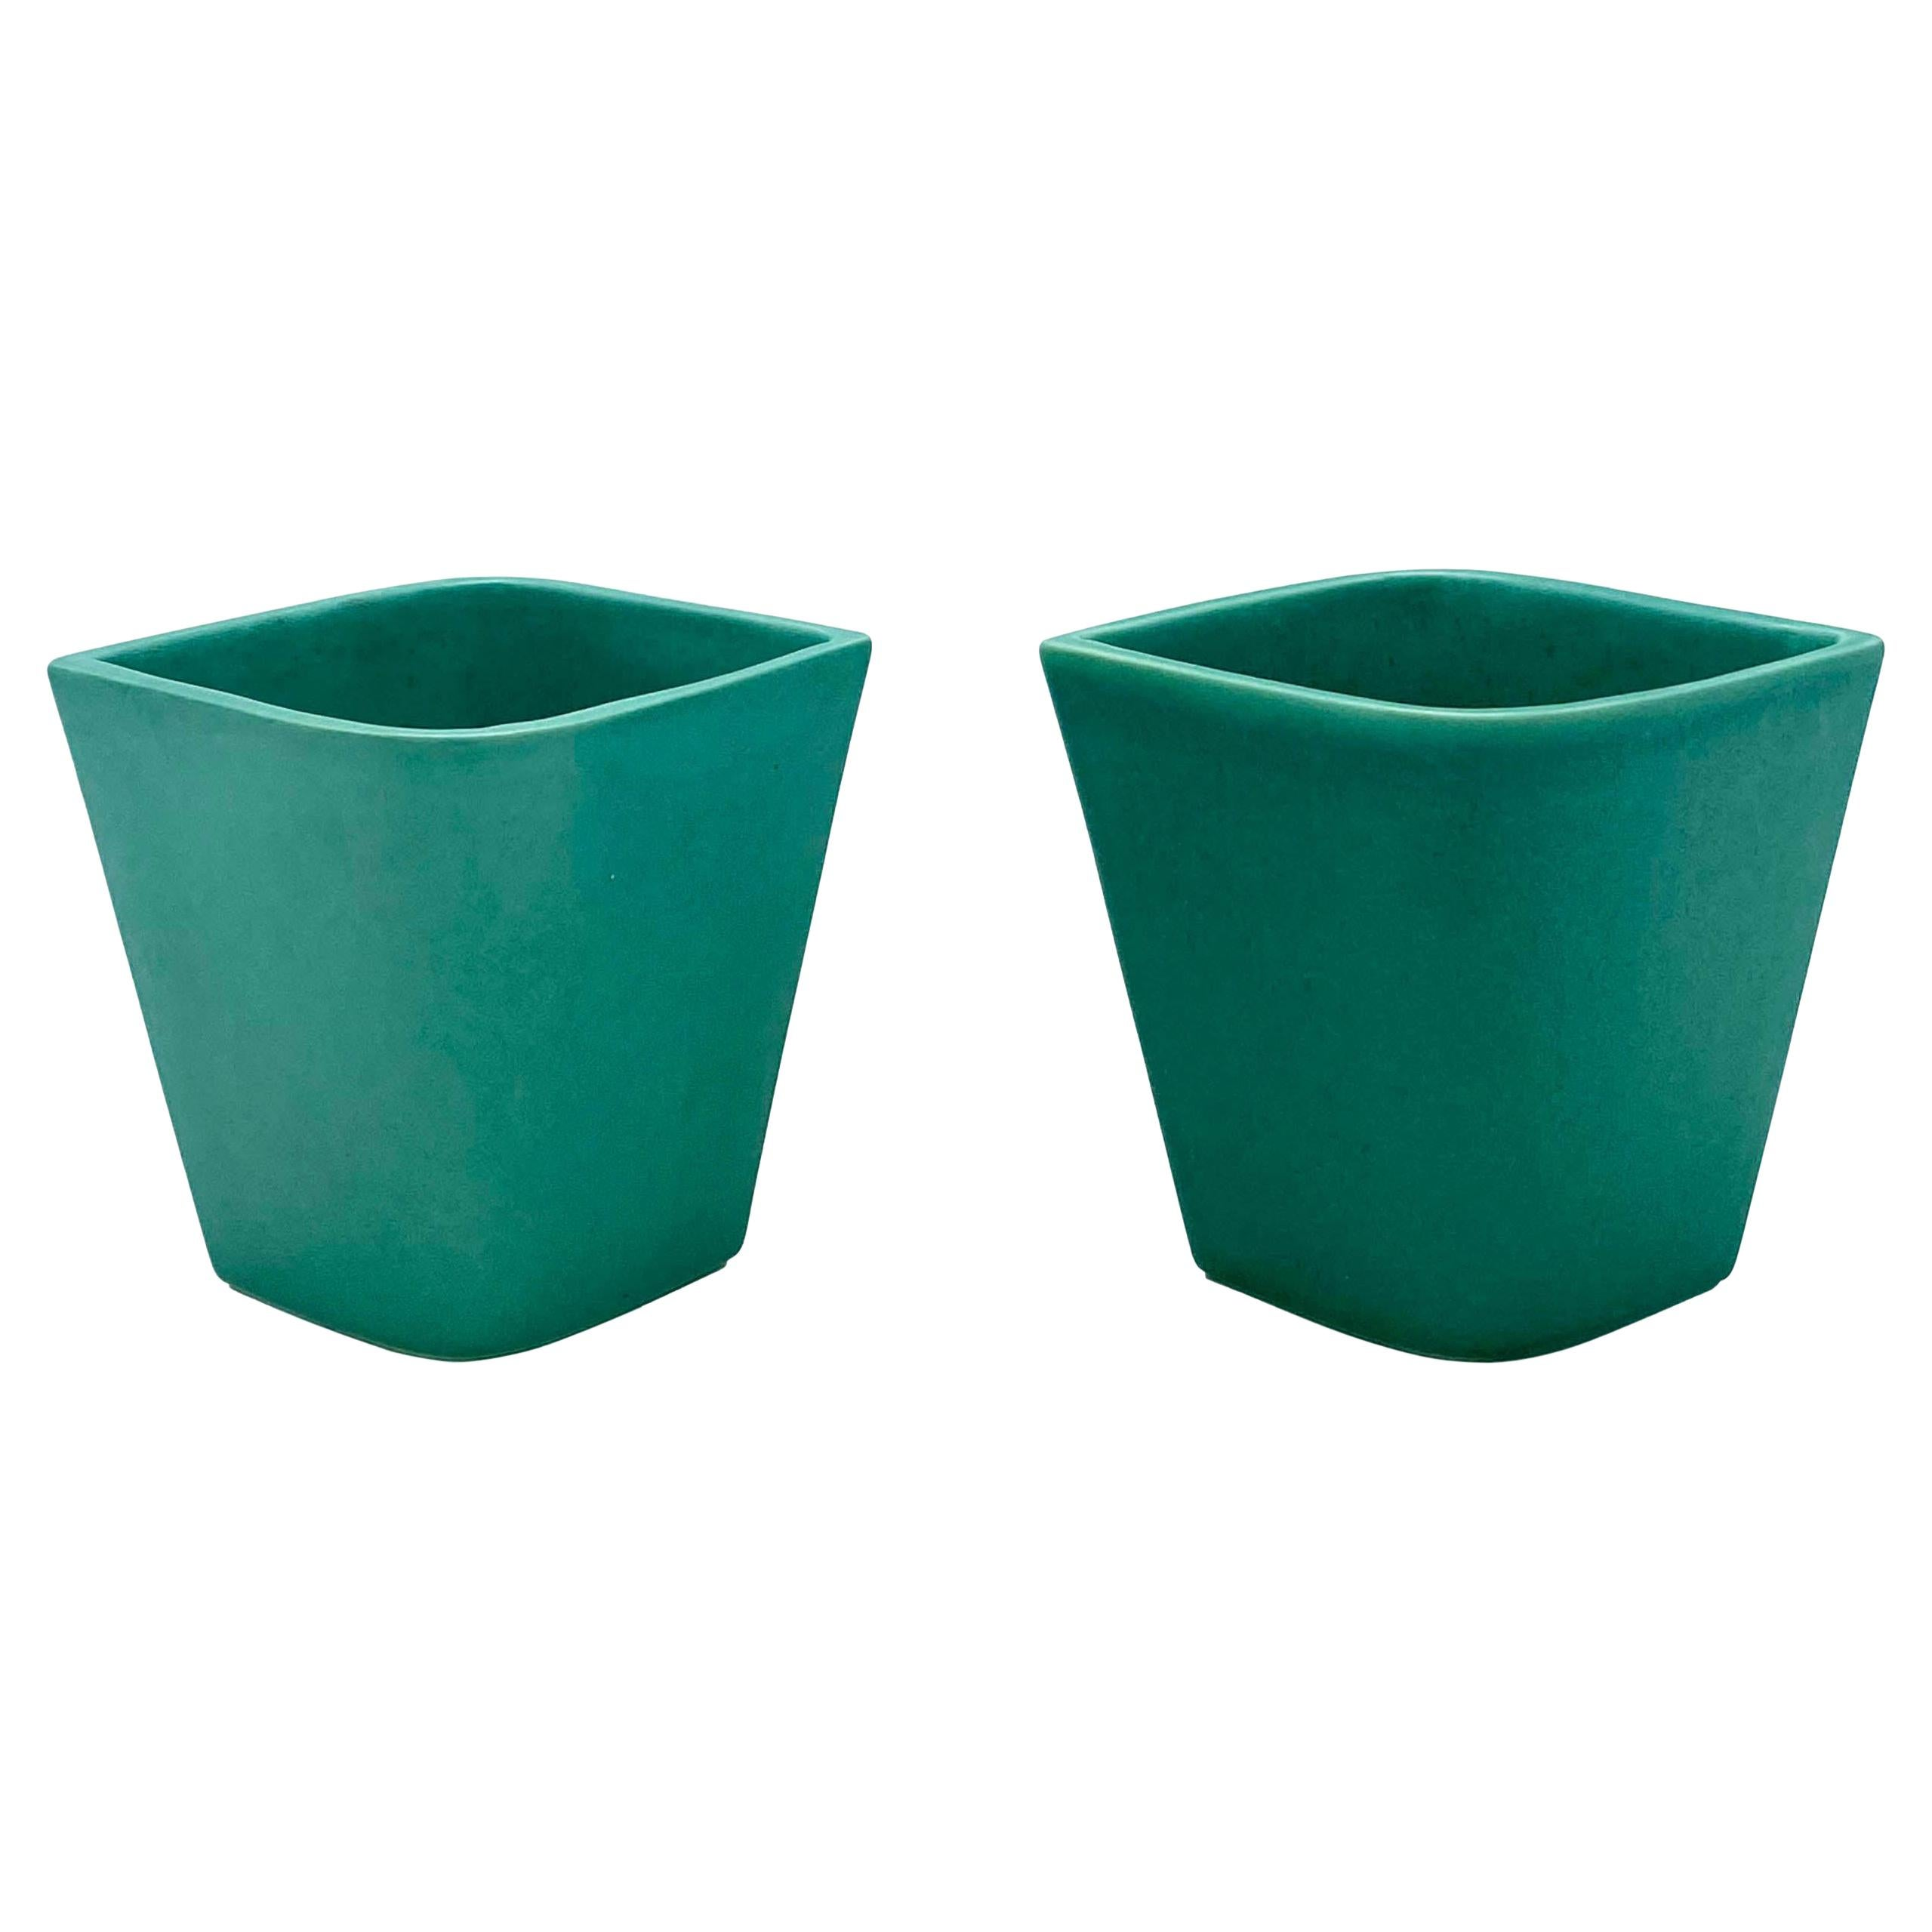 Gio Ponti for Ginori Pair of Green Ceramic Little Vases, Italy 1930s